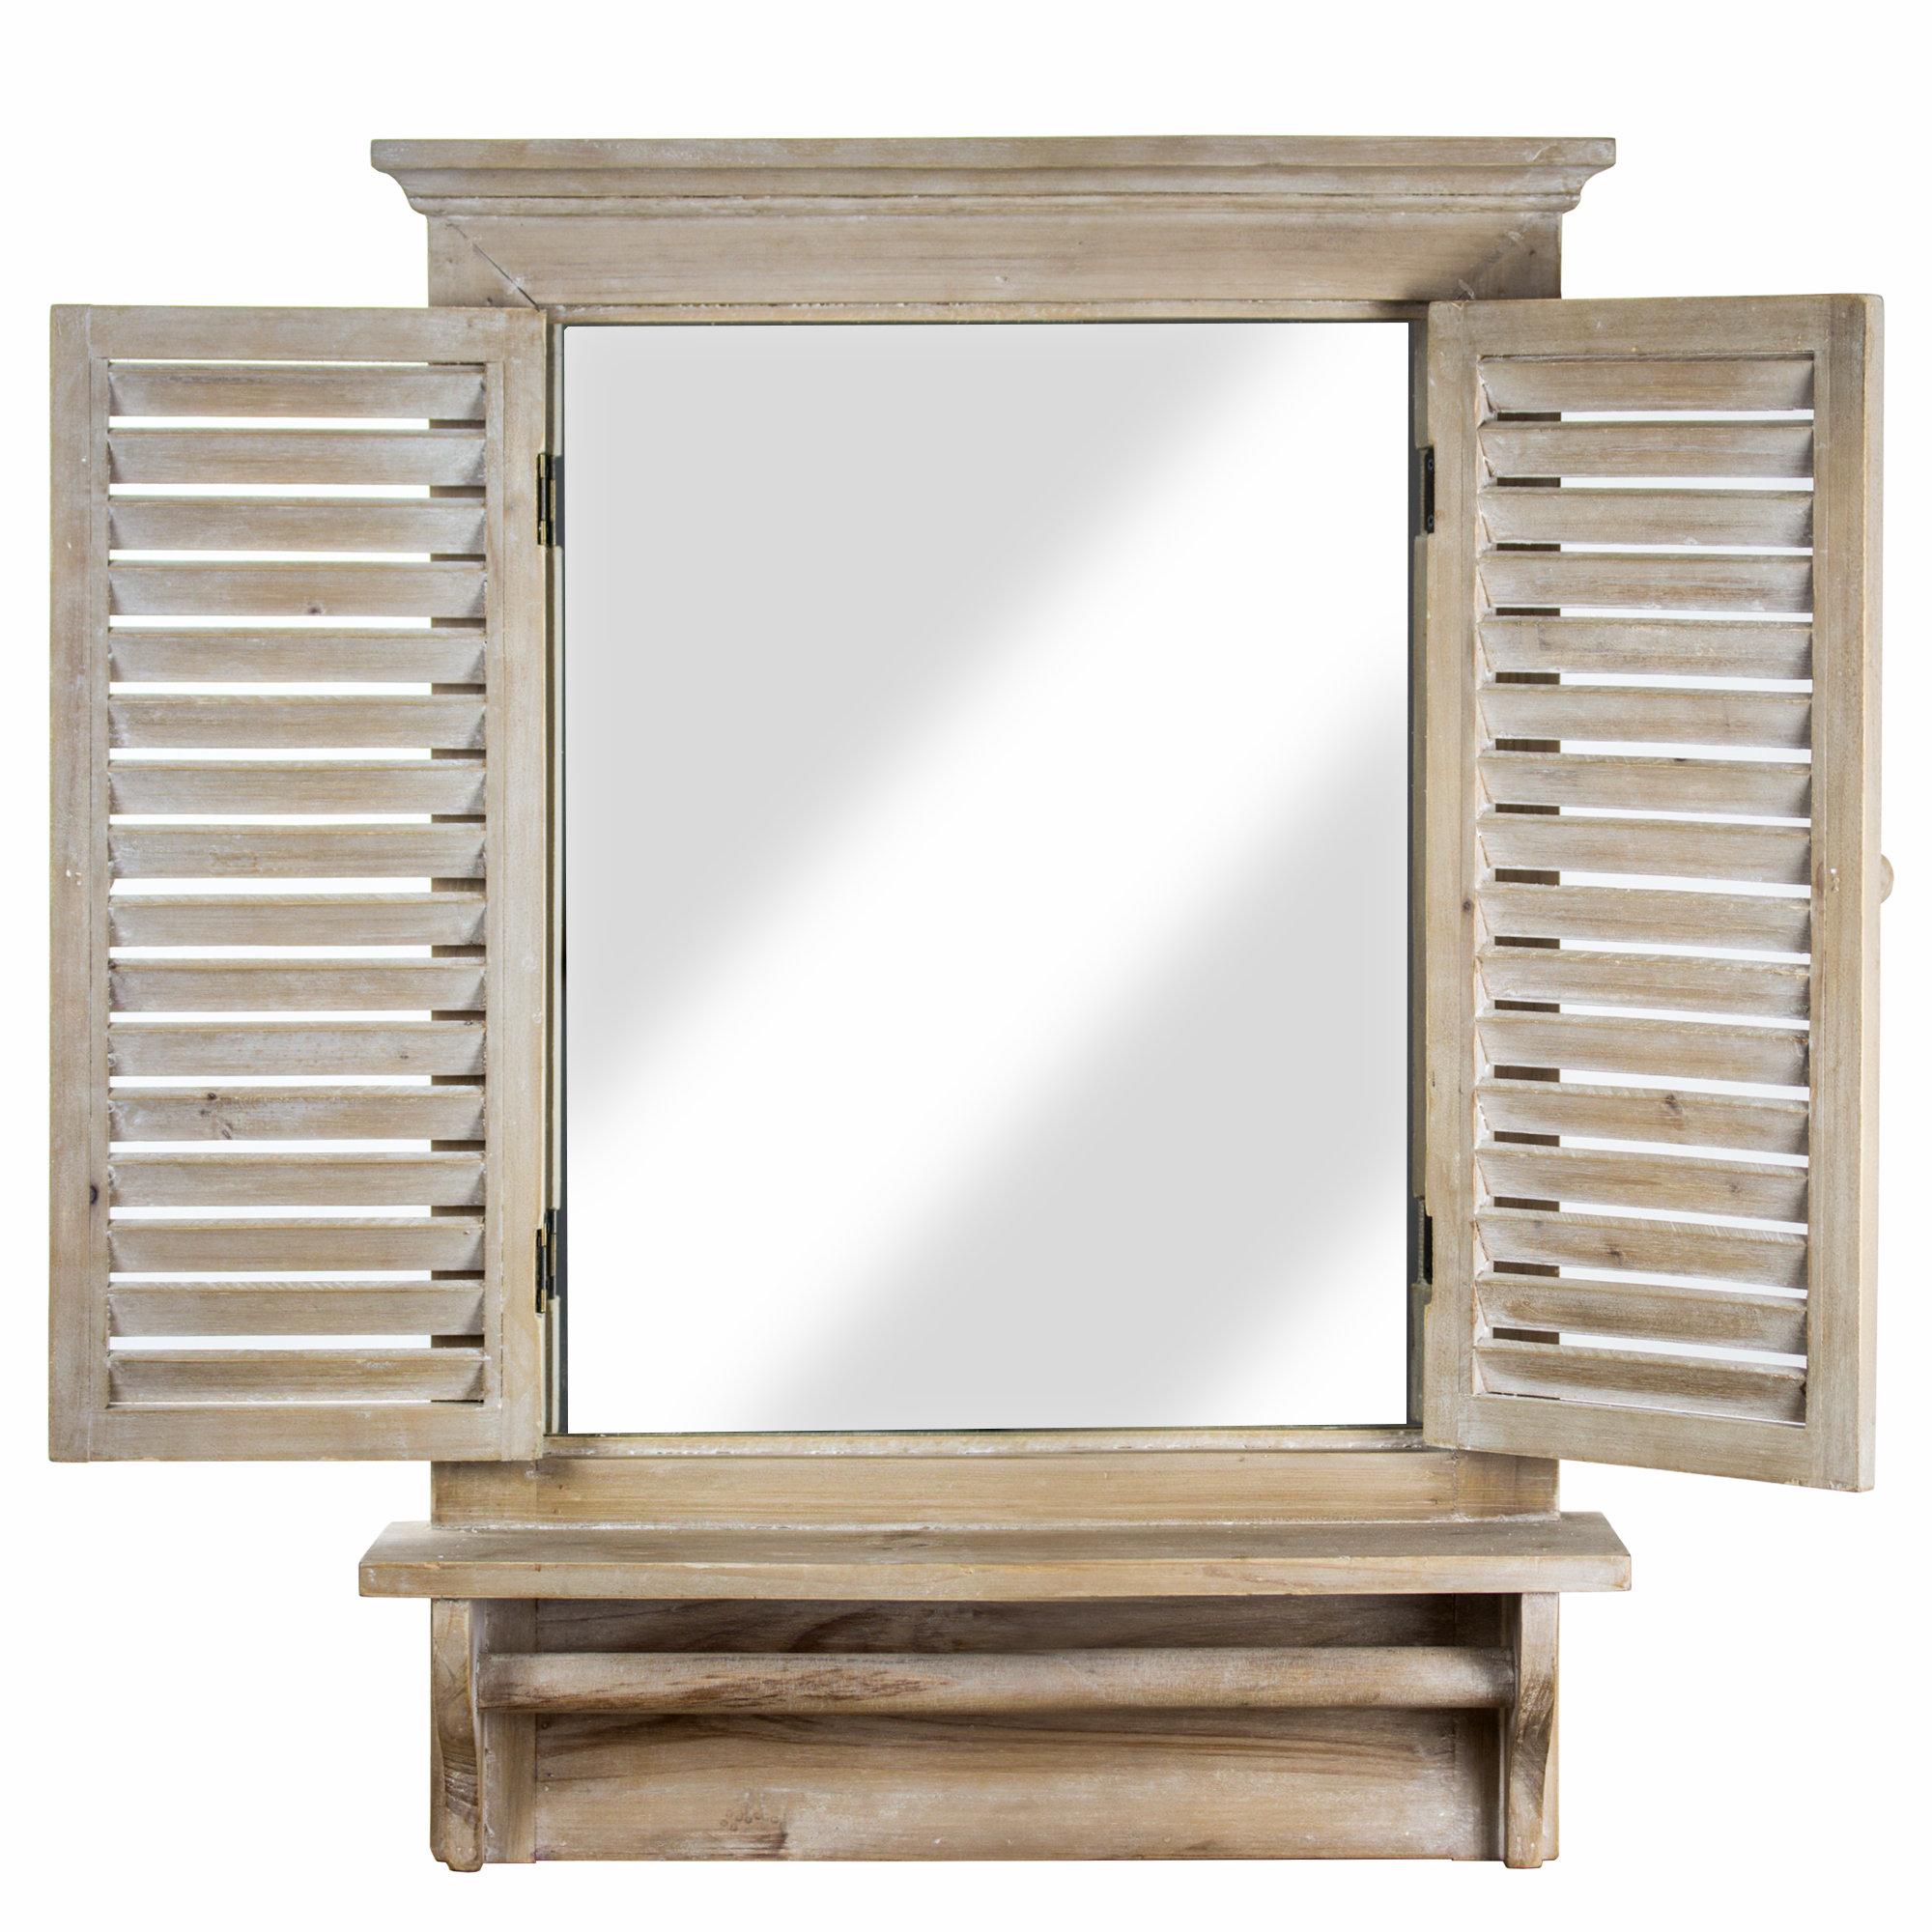 with by memoria shelf bathroom vitra en mirror stylepark regal